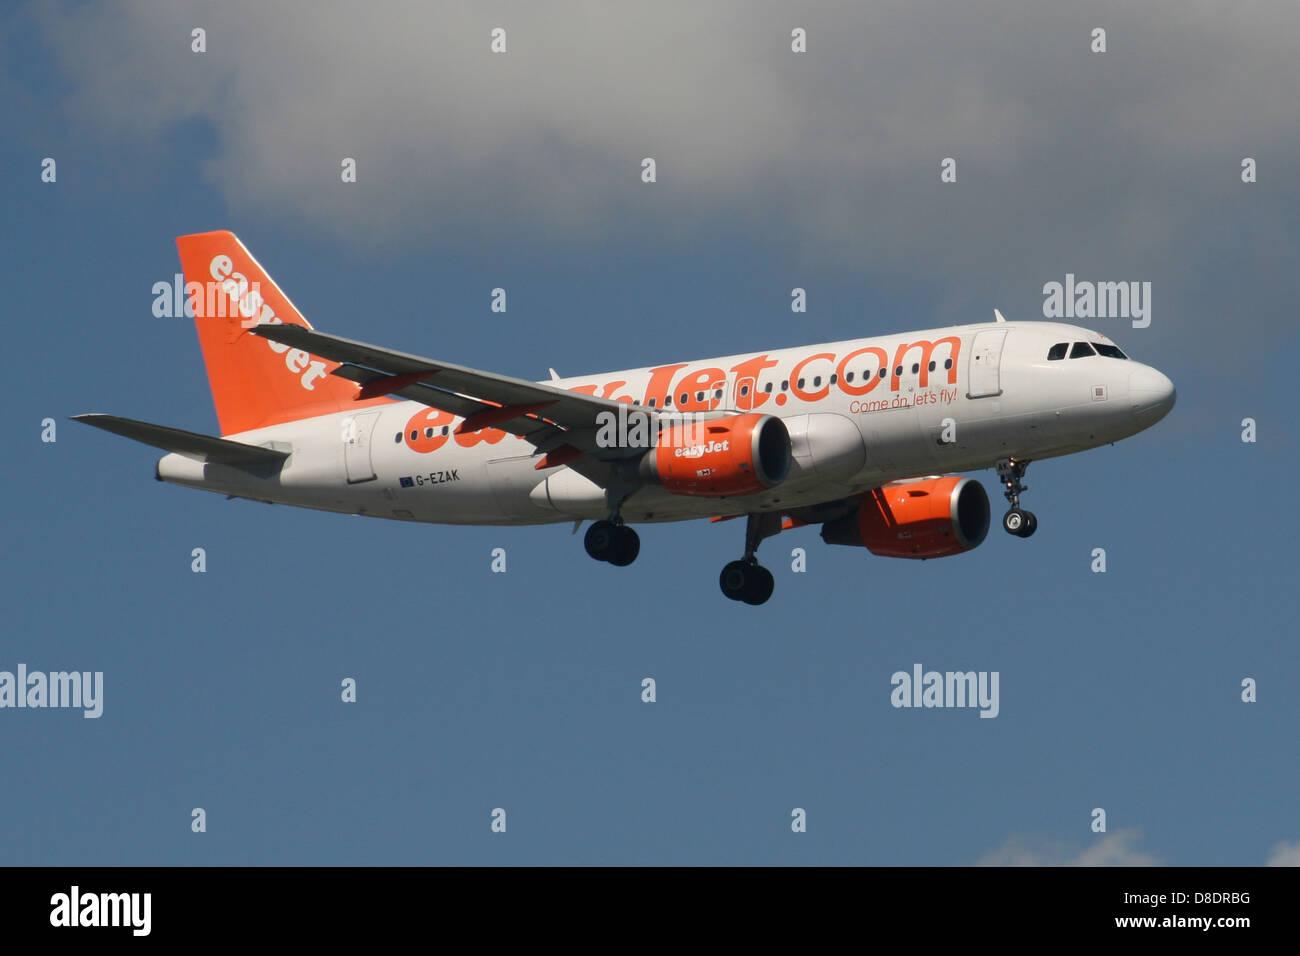 easyjet airbus - Stock Image